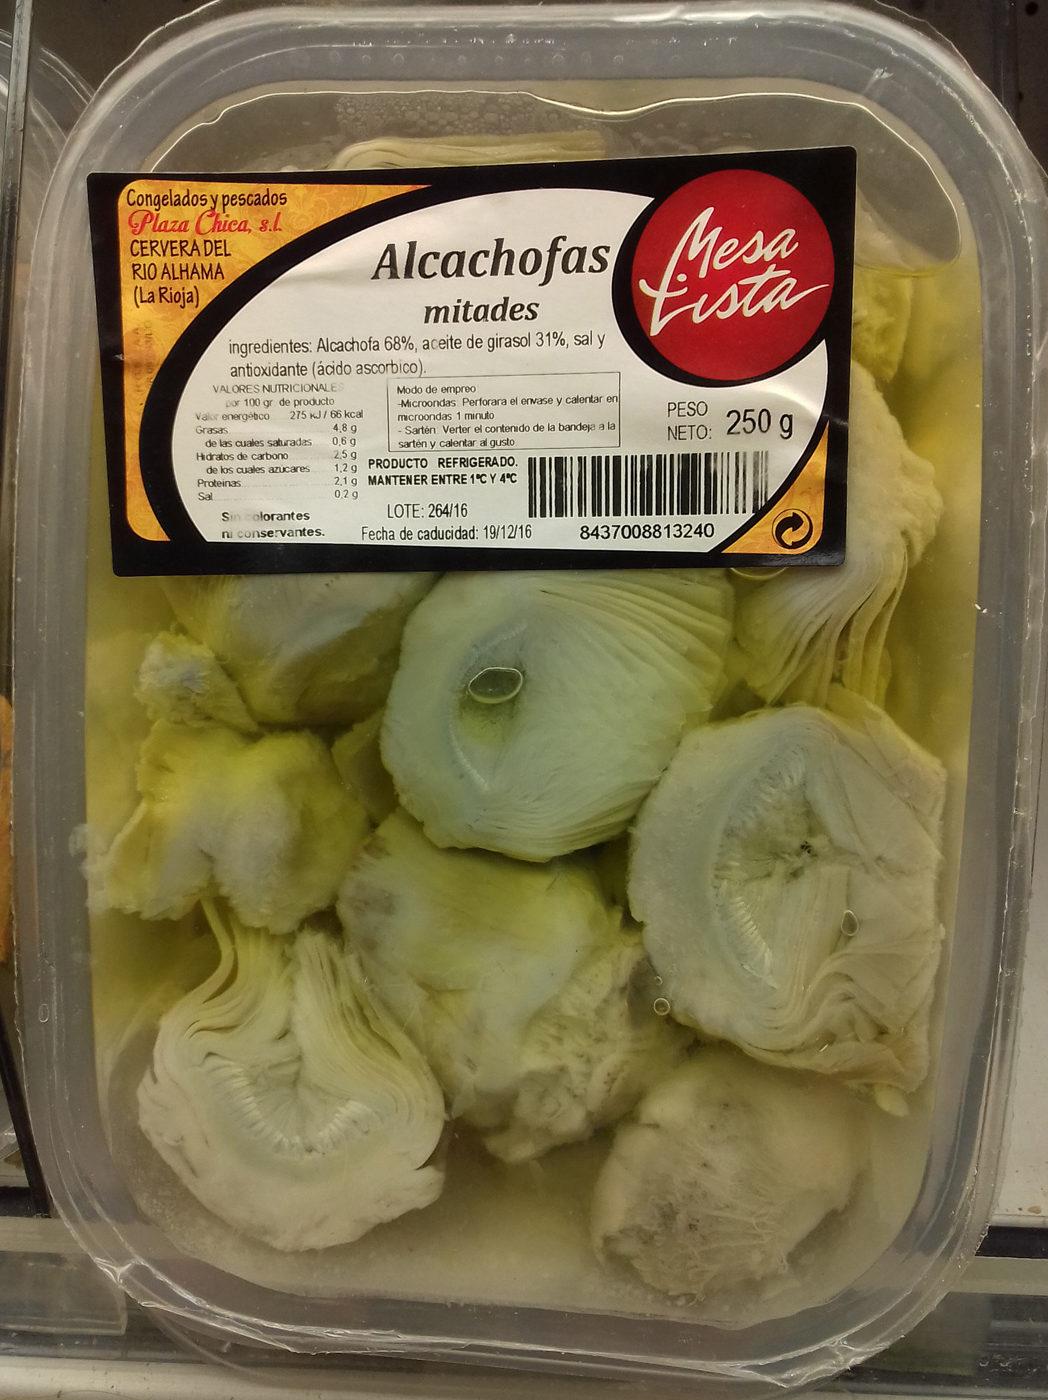 Alcachofas mitades - Produit - es